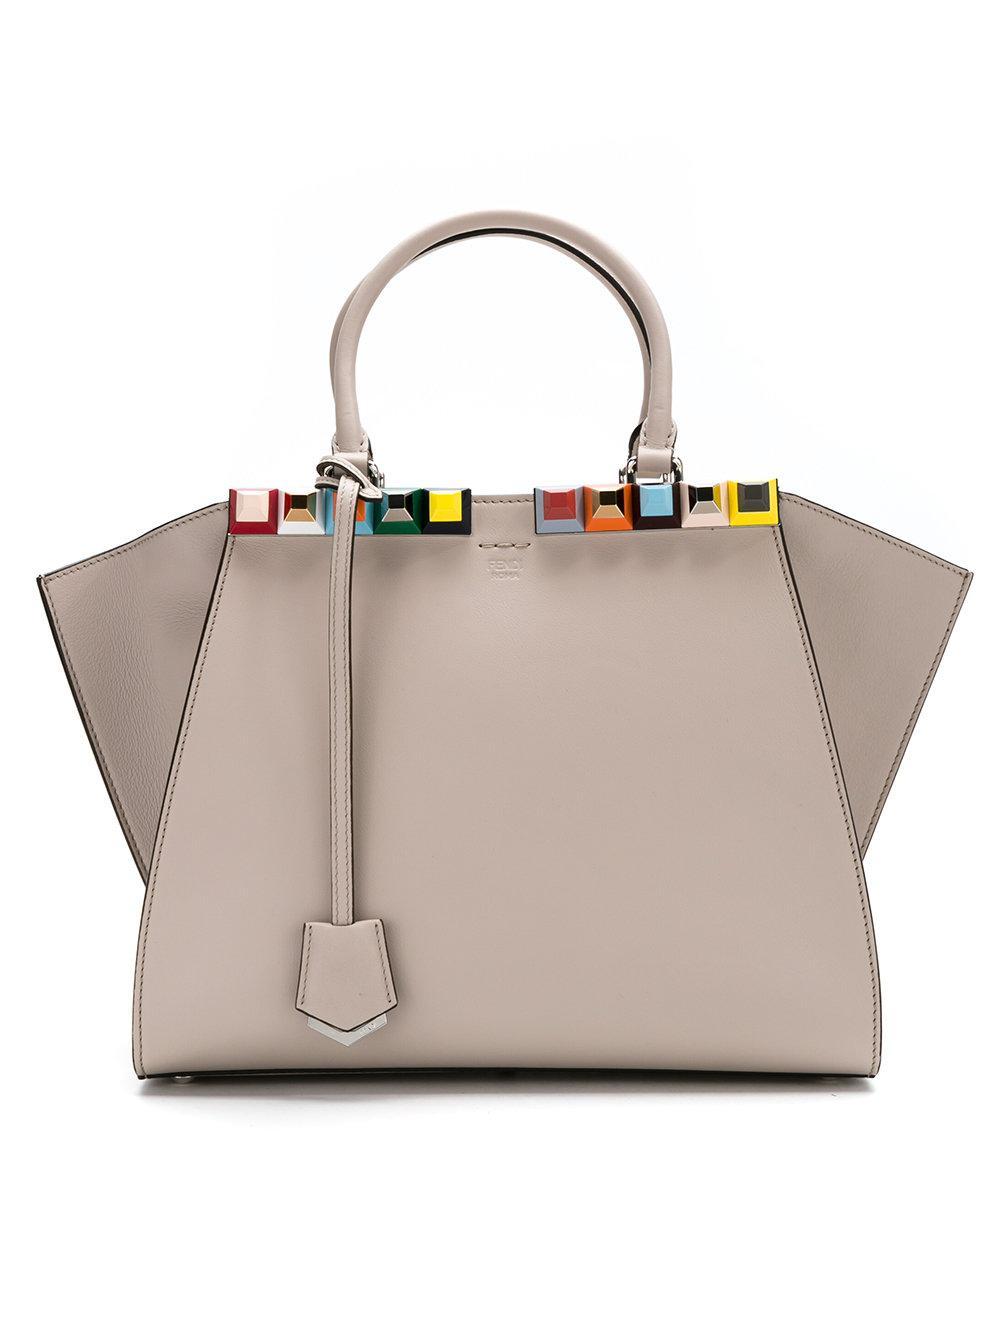 592ac907e9 Lyst - Fendi 3jours Handbag With Multicolor Studs in Gray